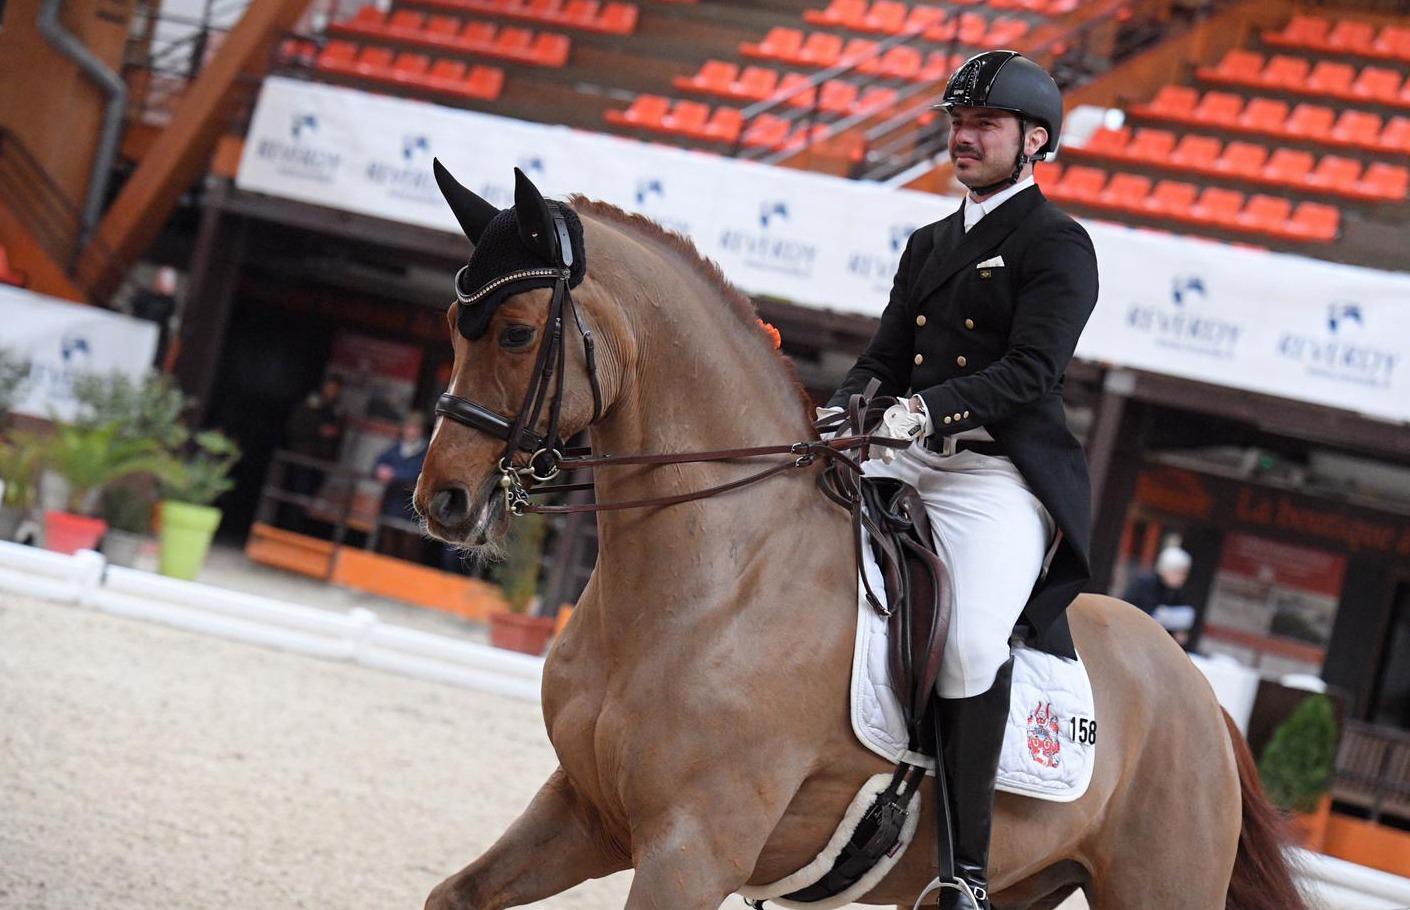 Rodolpho Riskalla briga por uma vaga nos Jogos Pan-Americanos 2019